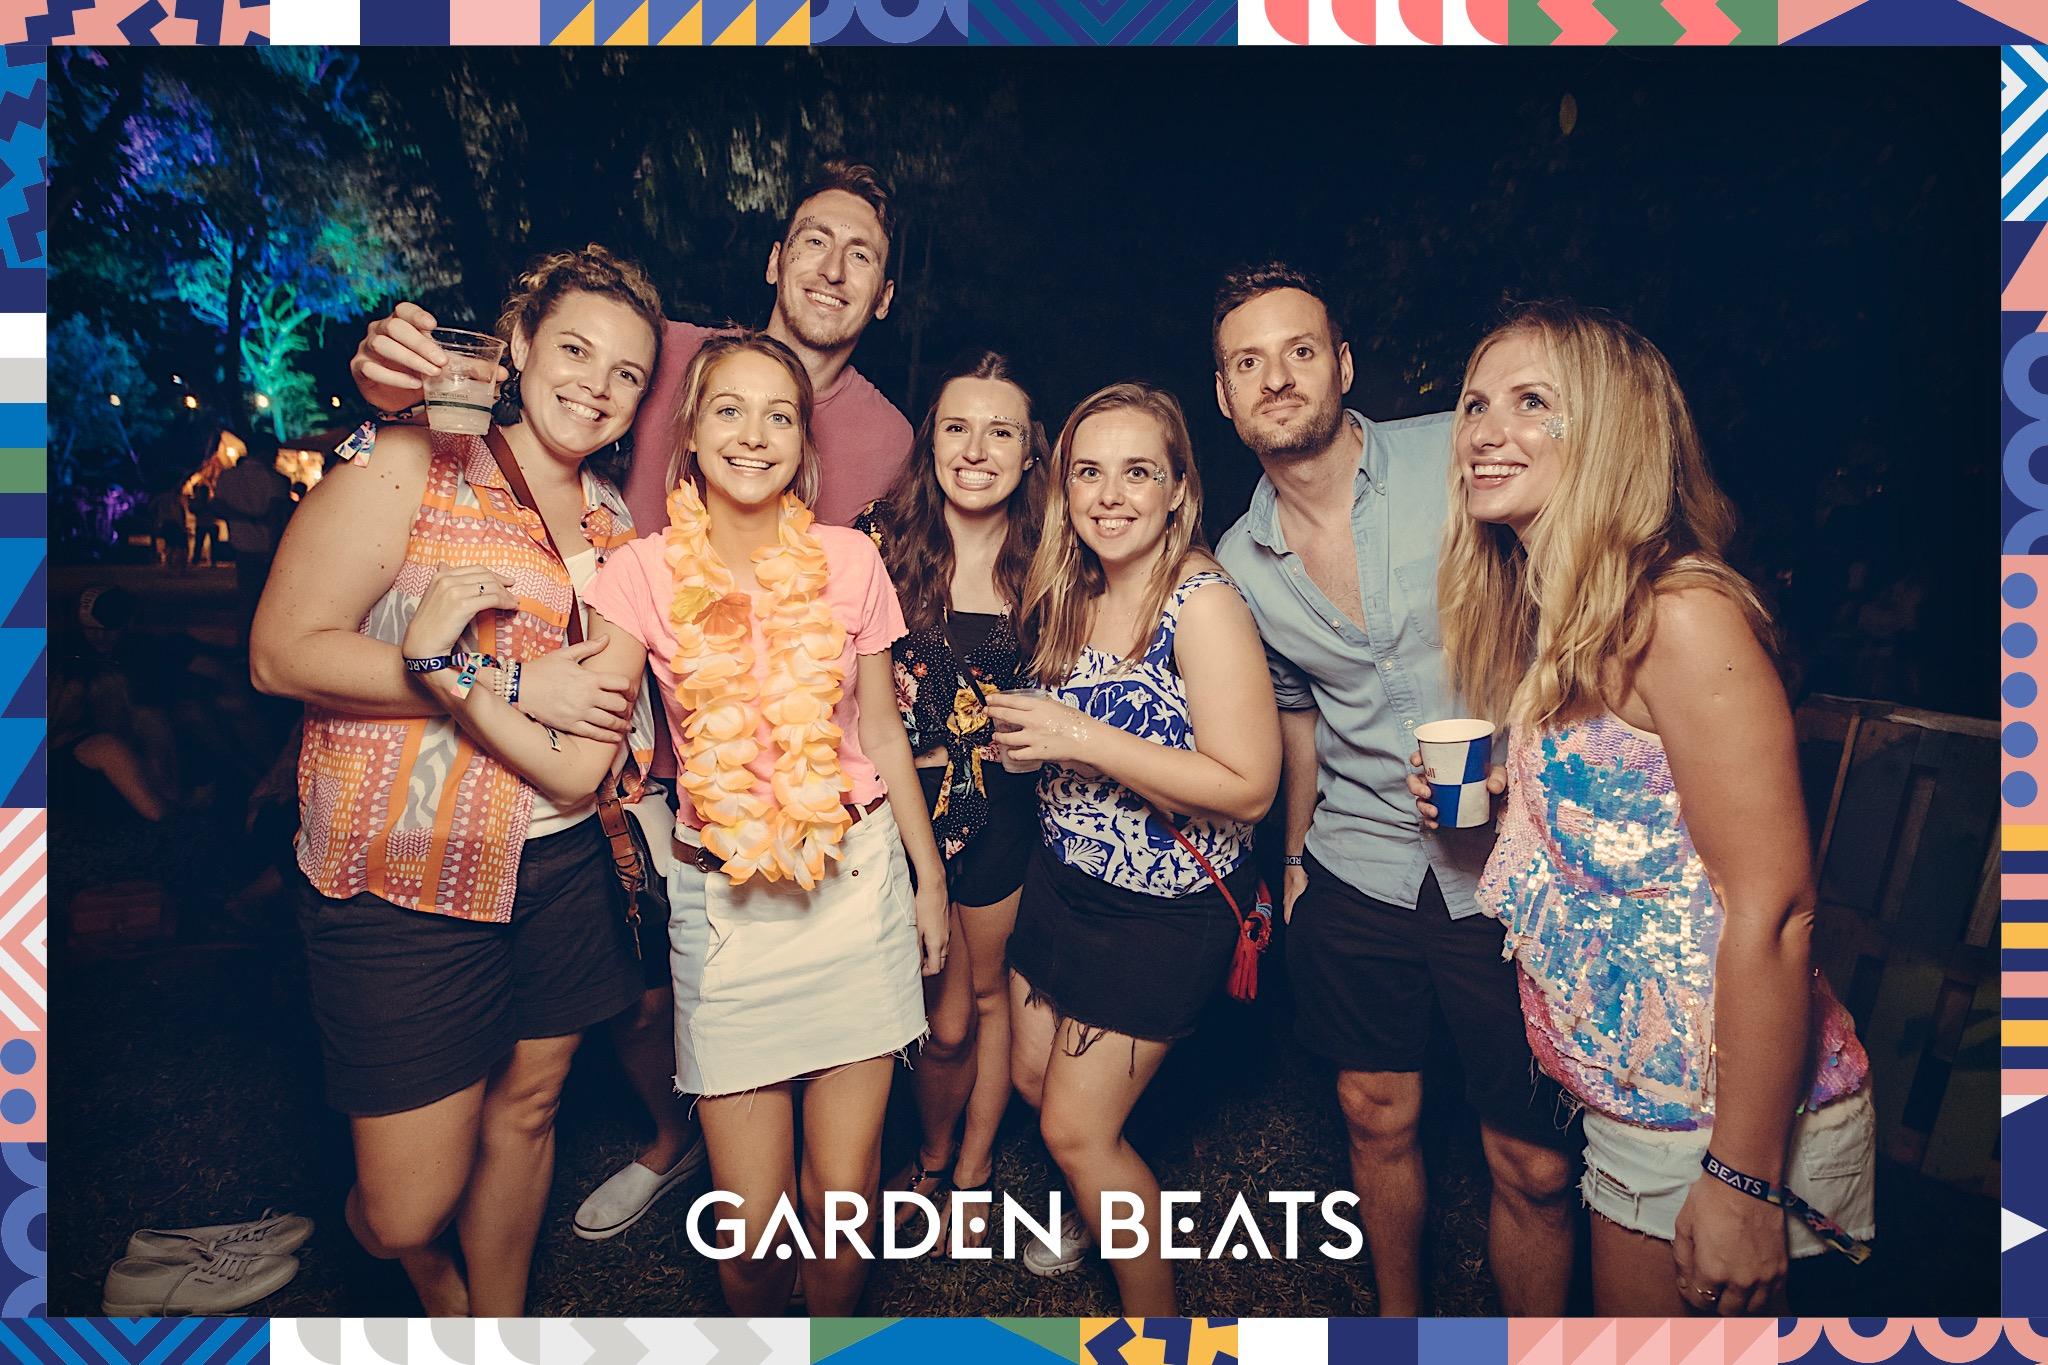 03032018_GardenBeats_Colossal837_Watermarked.jpg